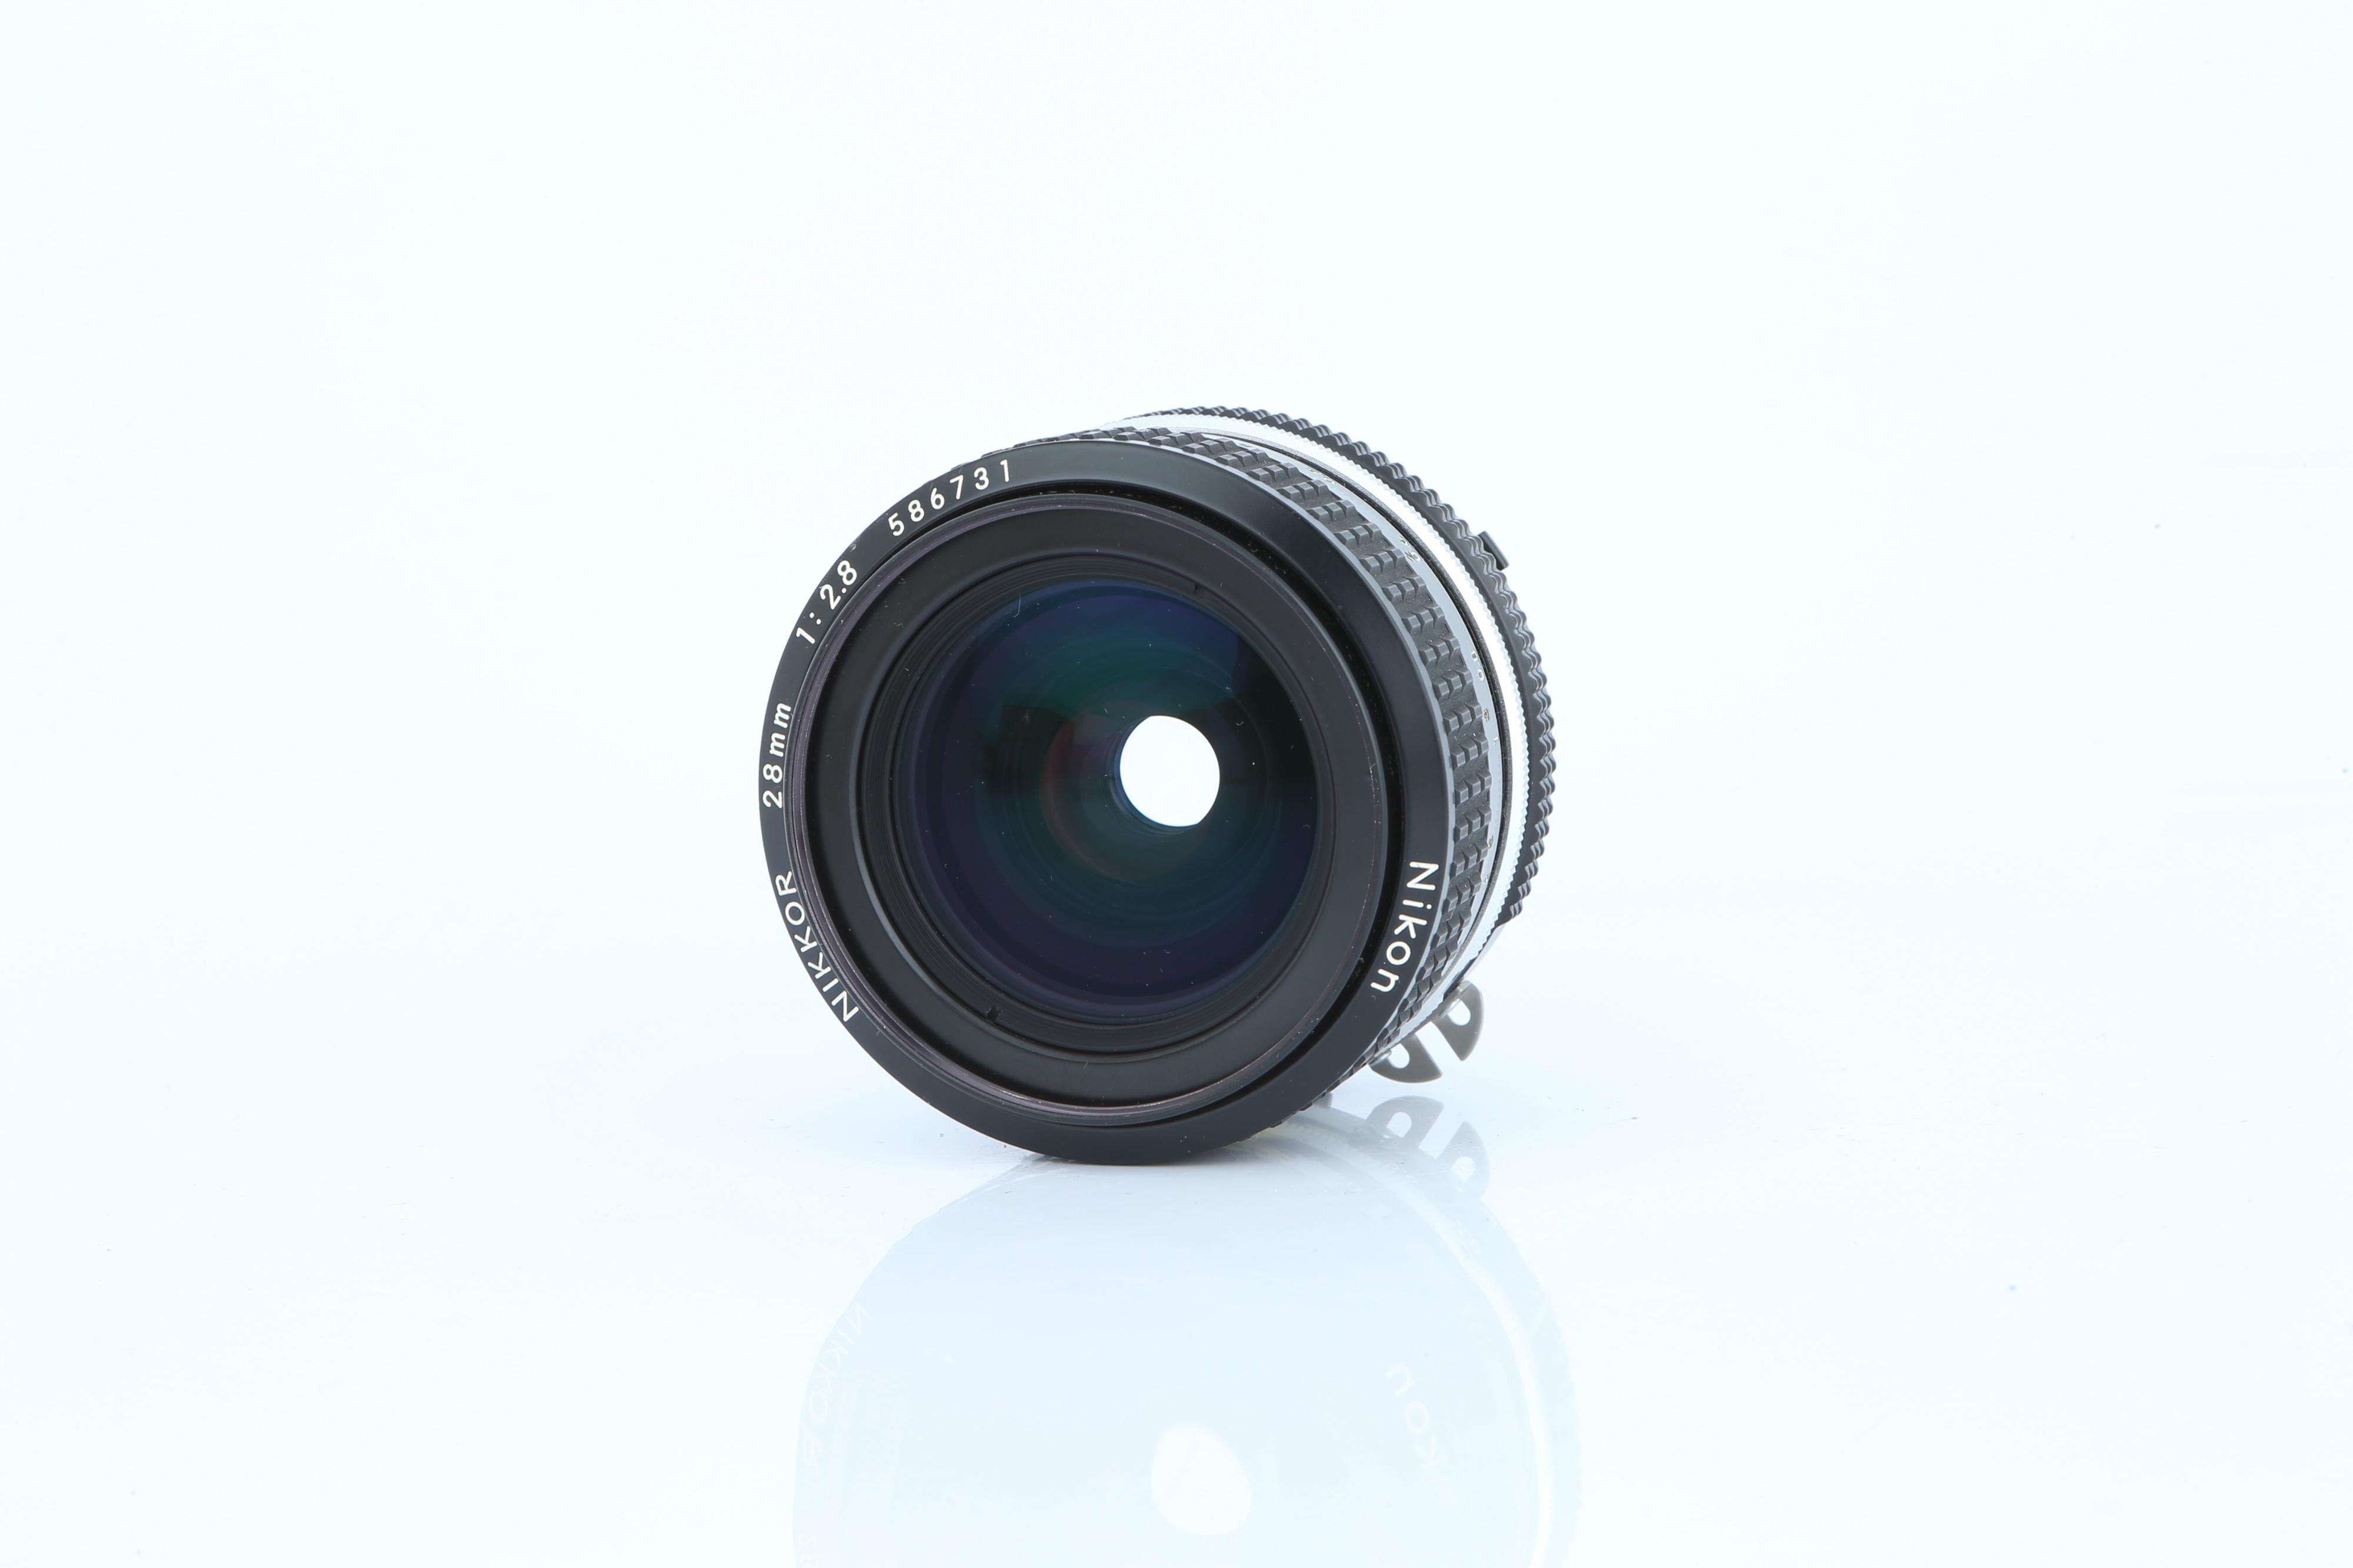 A Nikon Ai Nikkor f/2.8 28mm Lens - Image 2 of 3